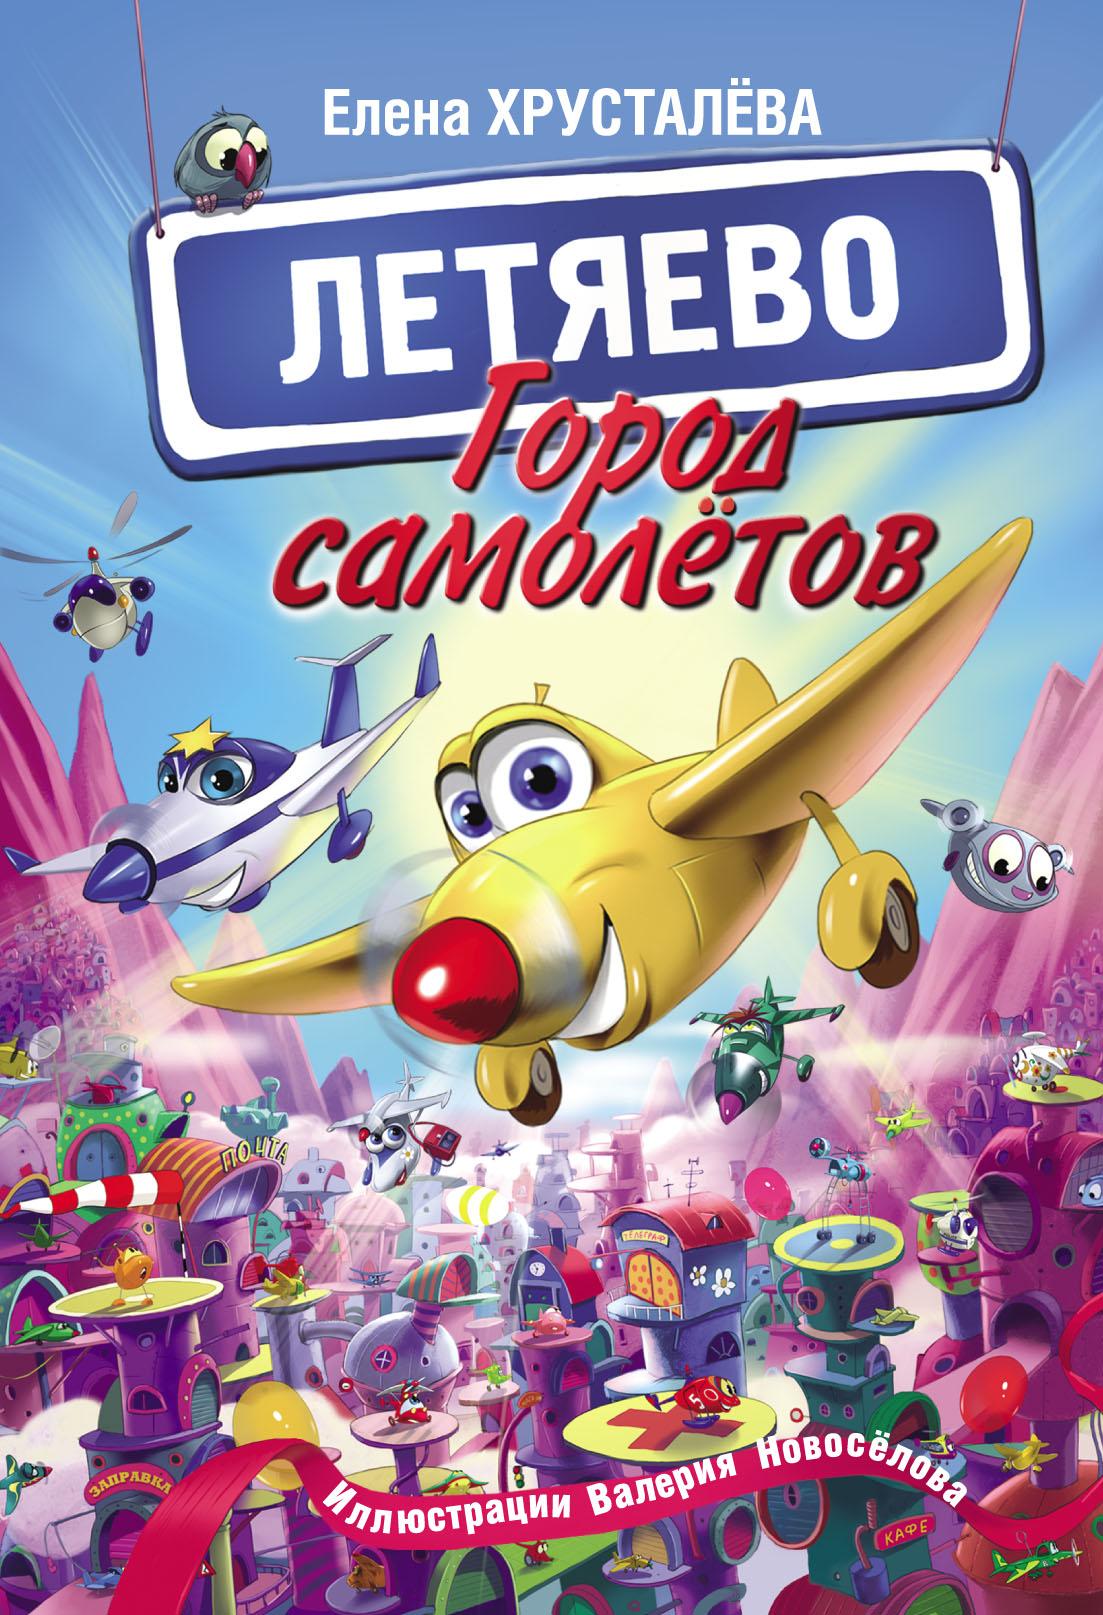 Город самолётов – Летяево